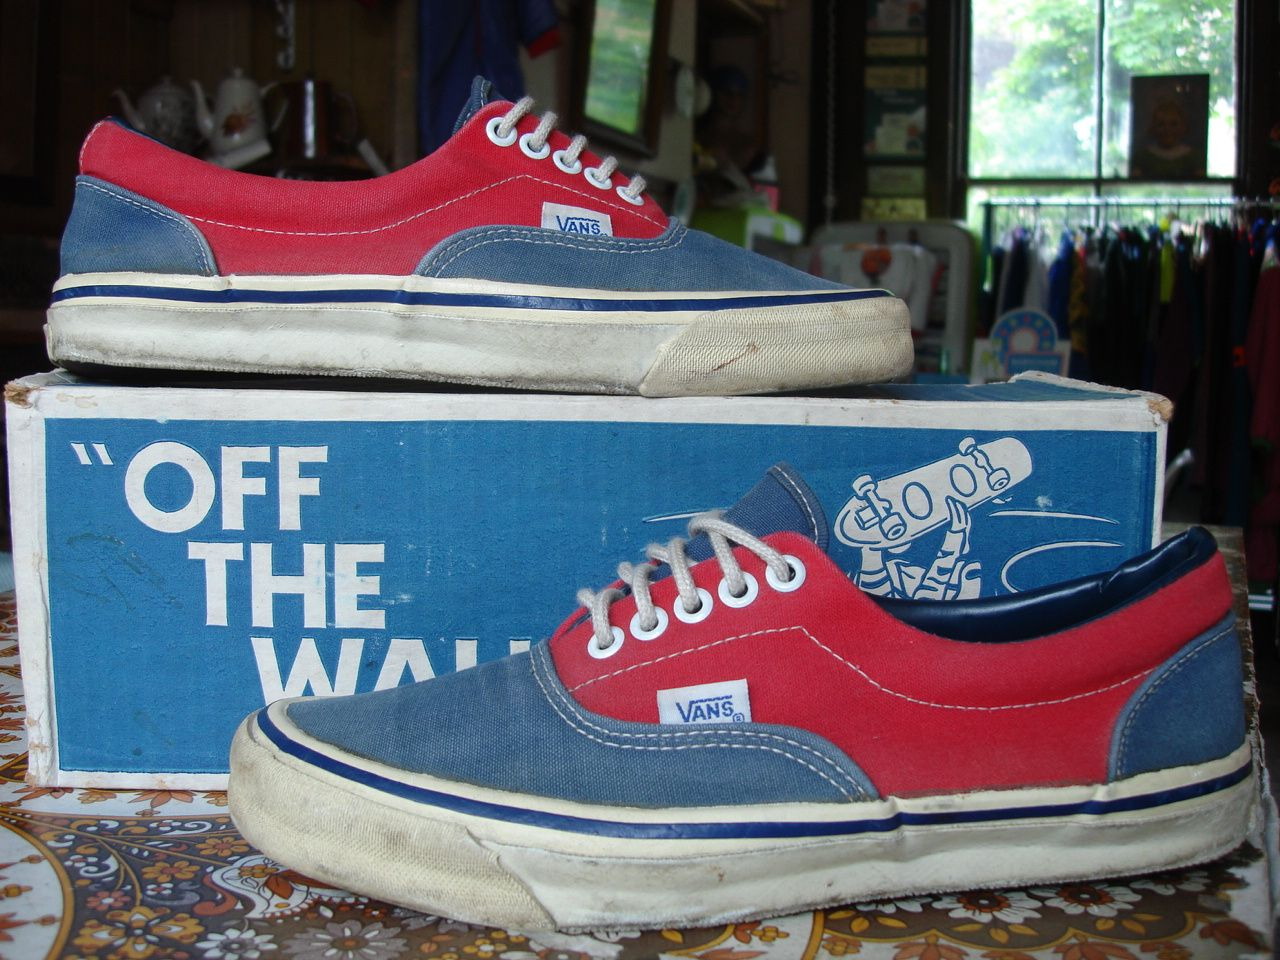 Pin on Vans shoe tribute